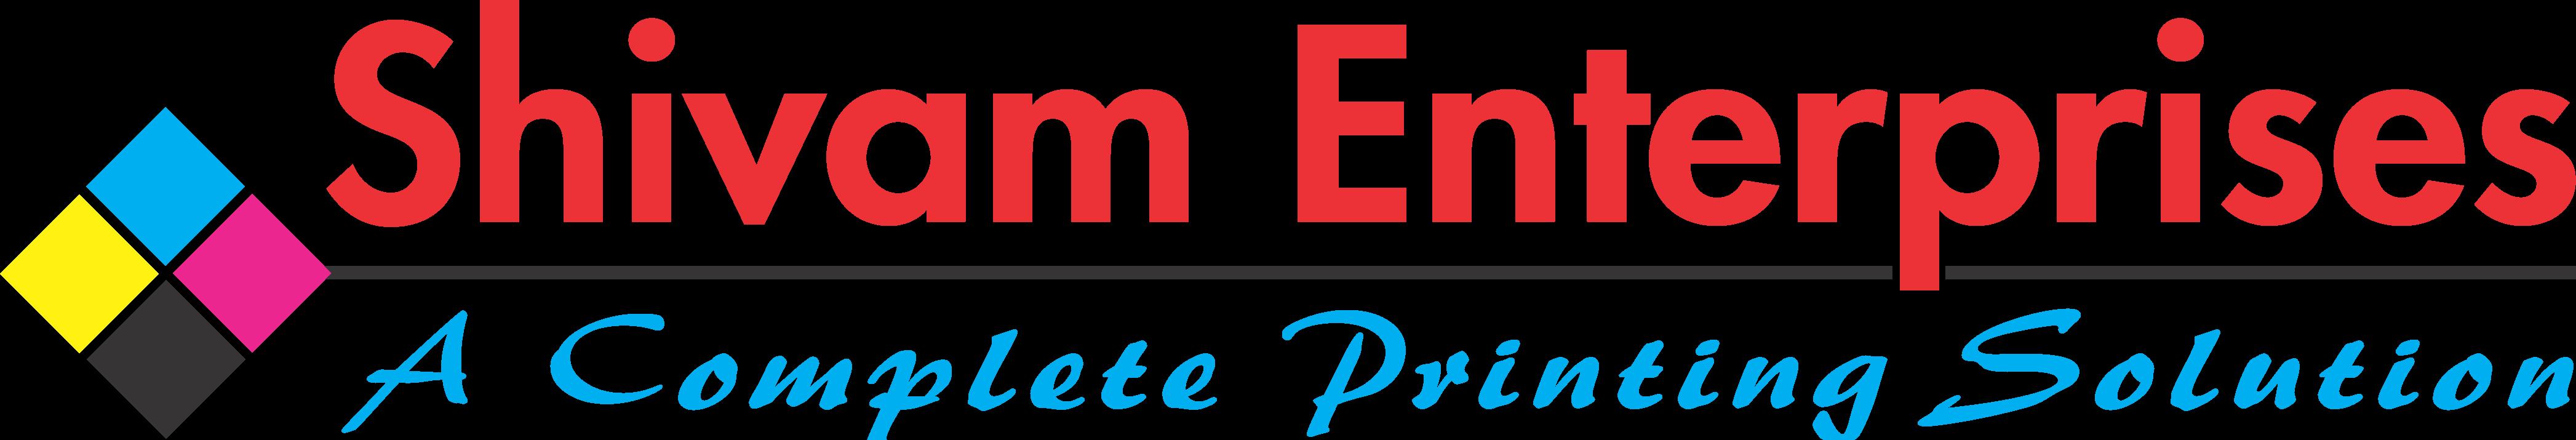 shivam enterprises logo